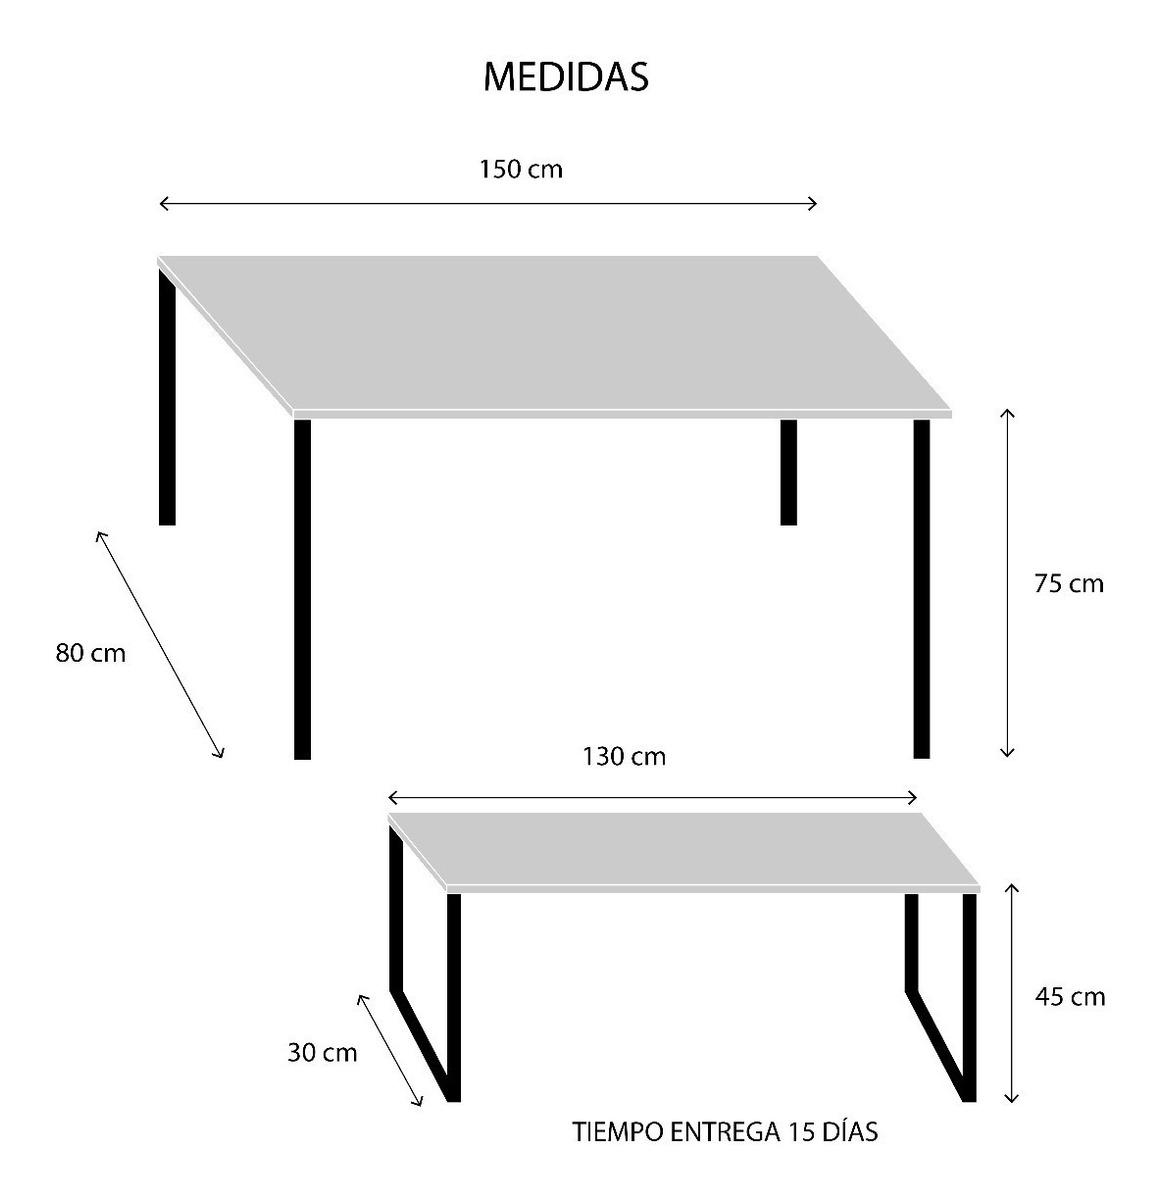 Mesa Comedor Hierro Madera 2 Bancos 150x80x75cm Electro Home